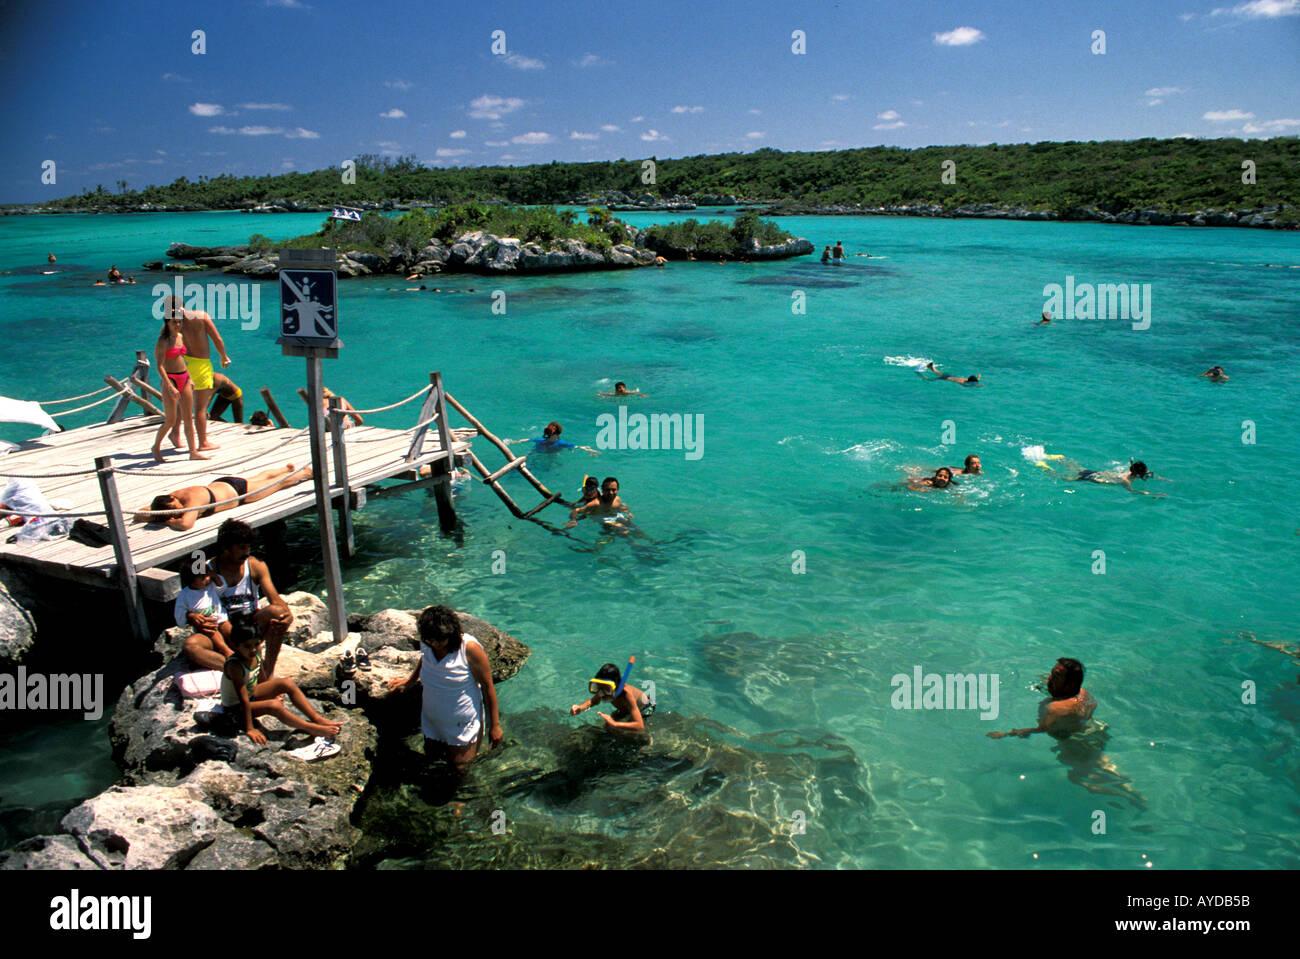 Mexico Yucatan Cancun Area Xel Ha Water Park